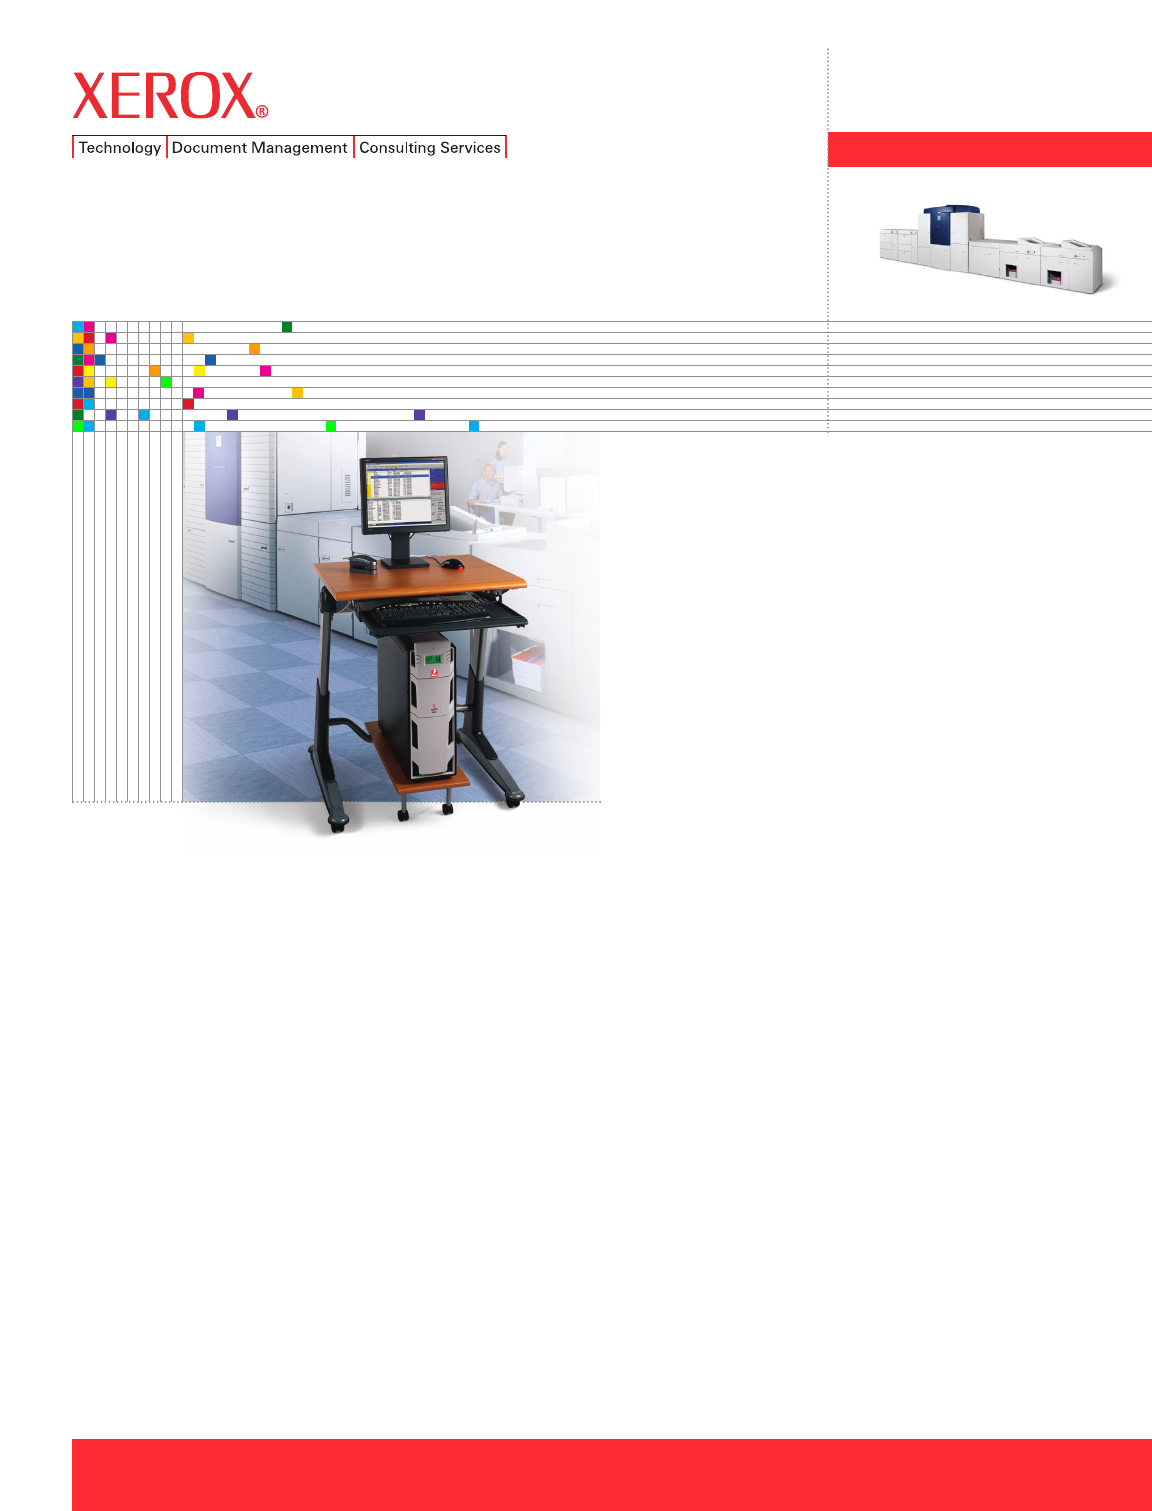 efi colorwise pro tools